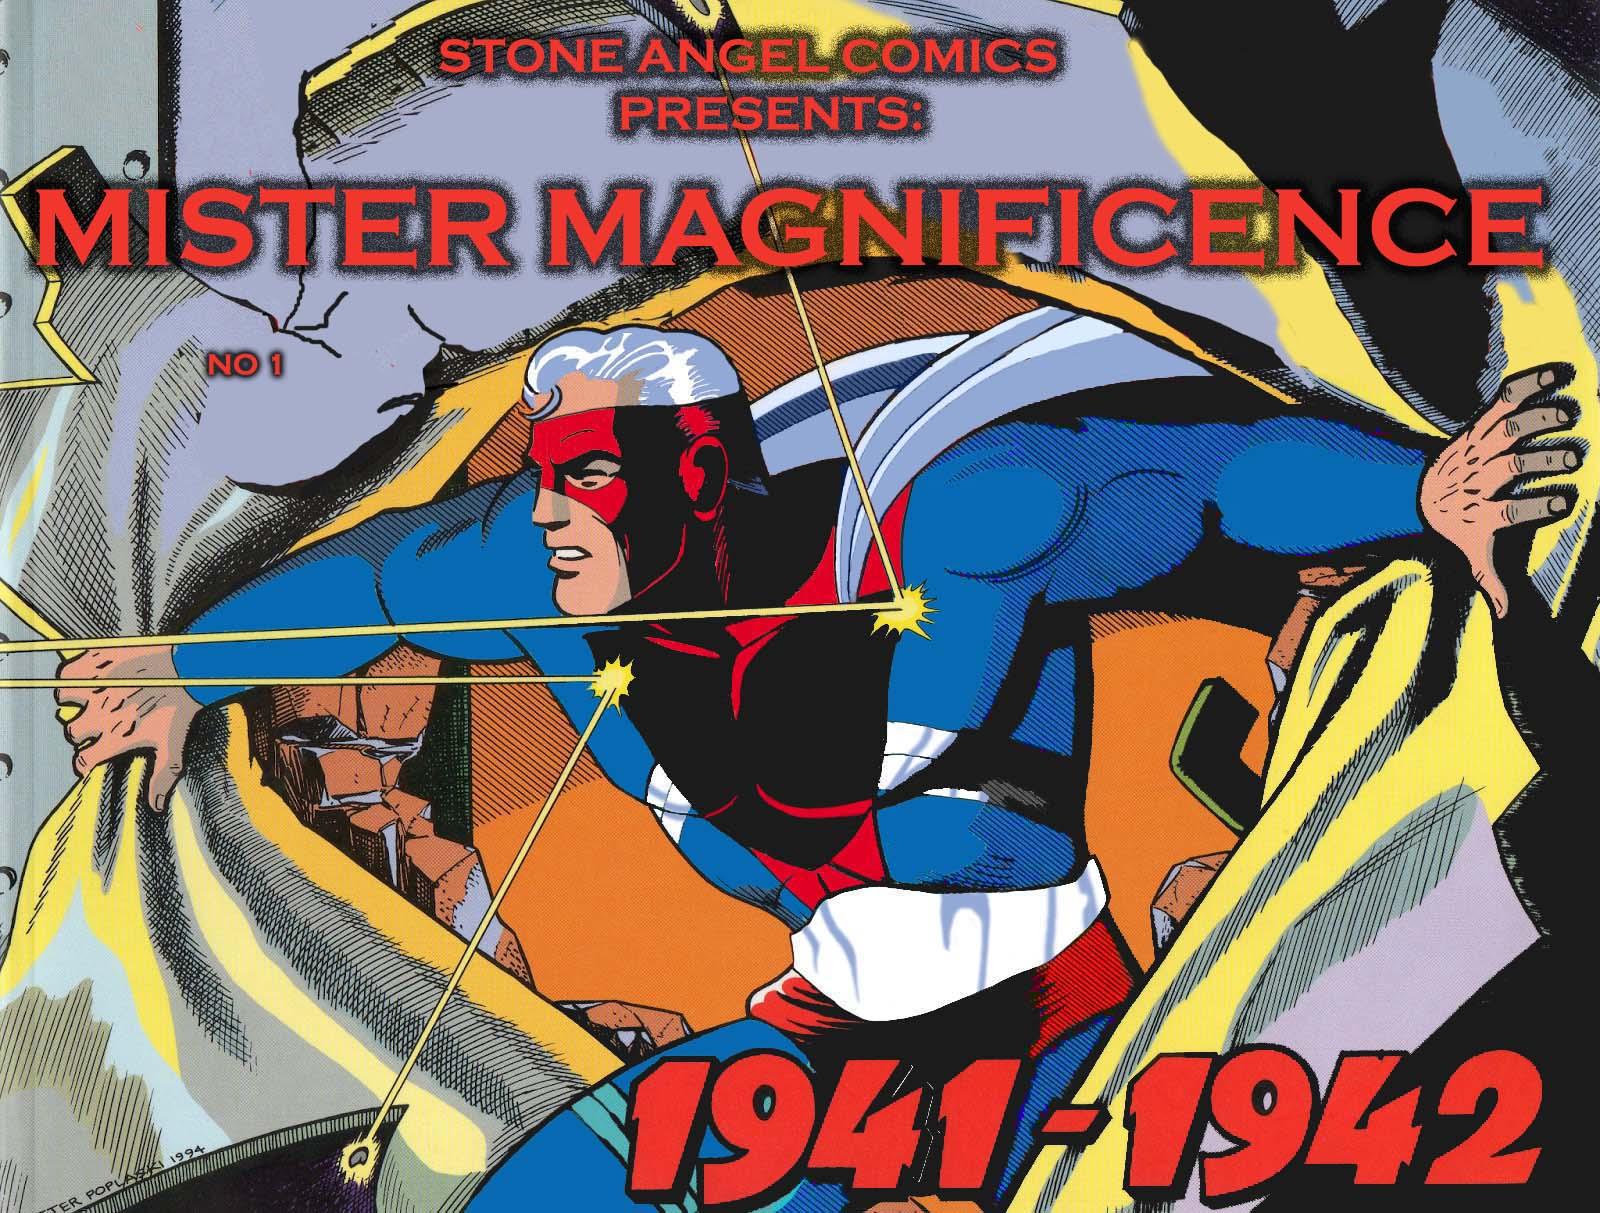 Mister Magnificence Reprints (1941-1942)